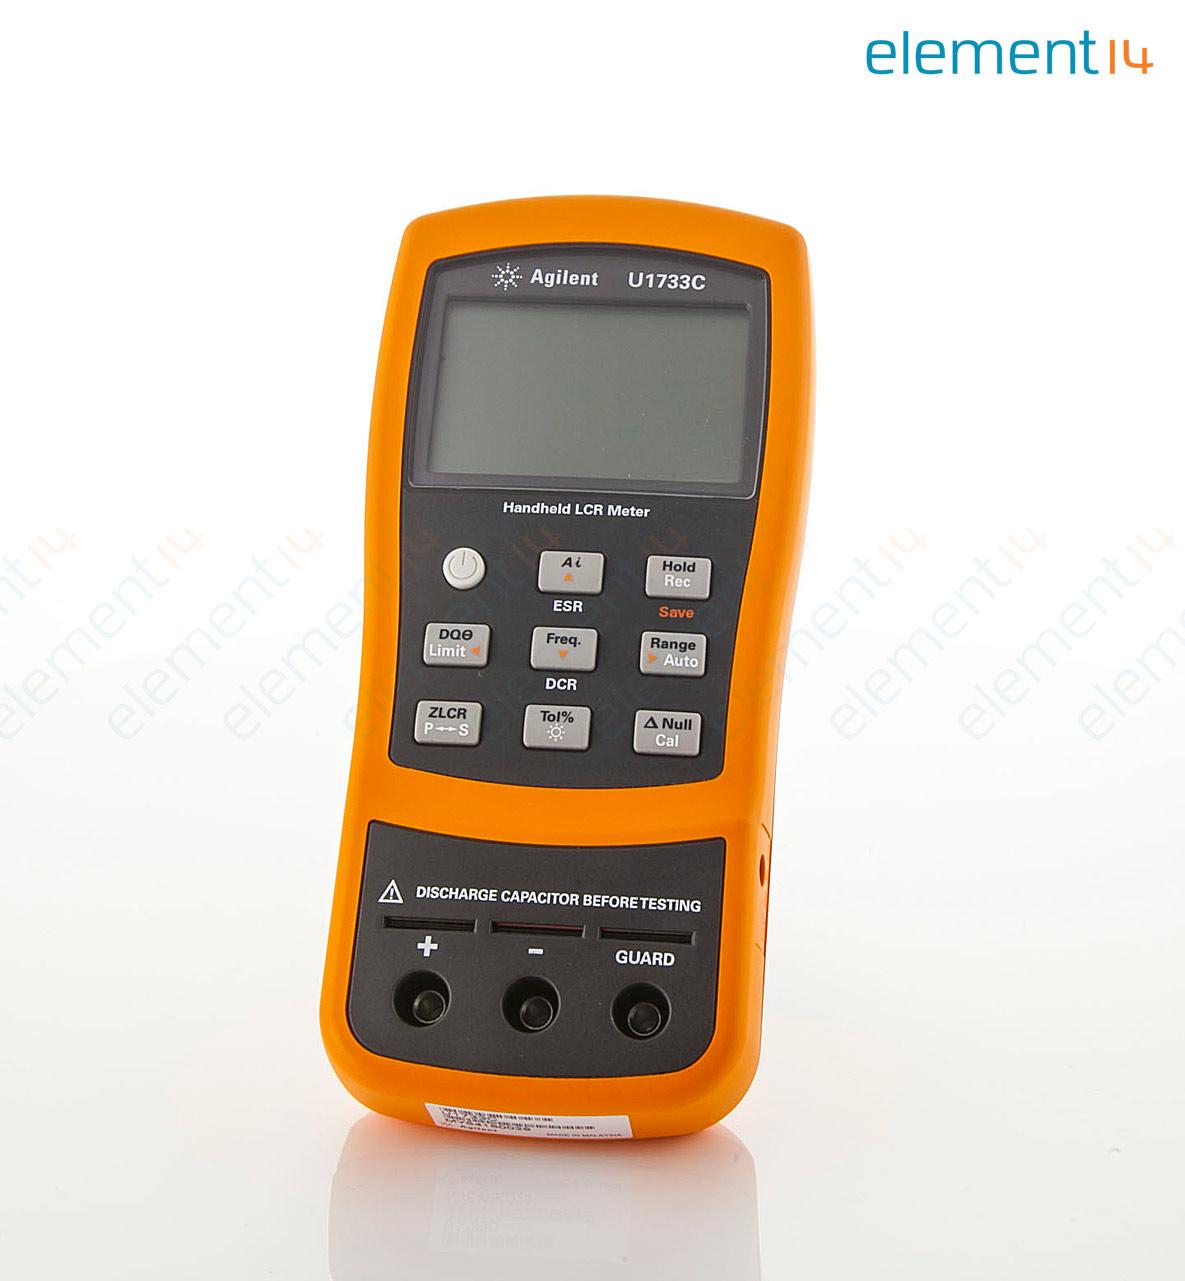 U1733c Keysight Technologies Lcr Meter Hand Held 100 Khz Q Block Diagram 2 Kh 20 Pf 02 Gohm U1730c Series